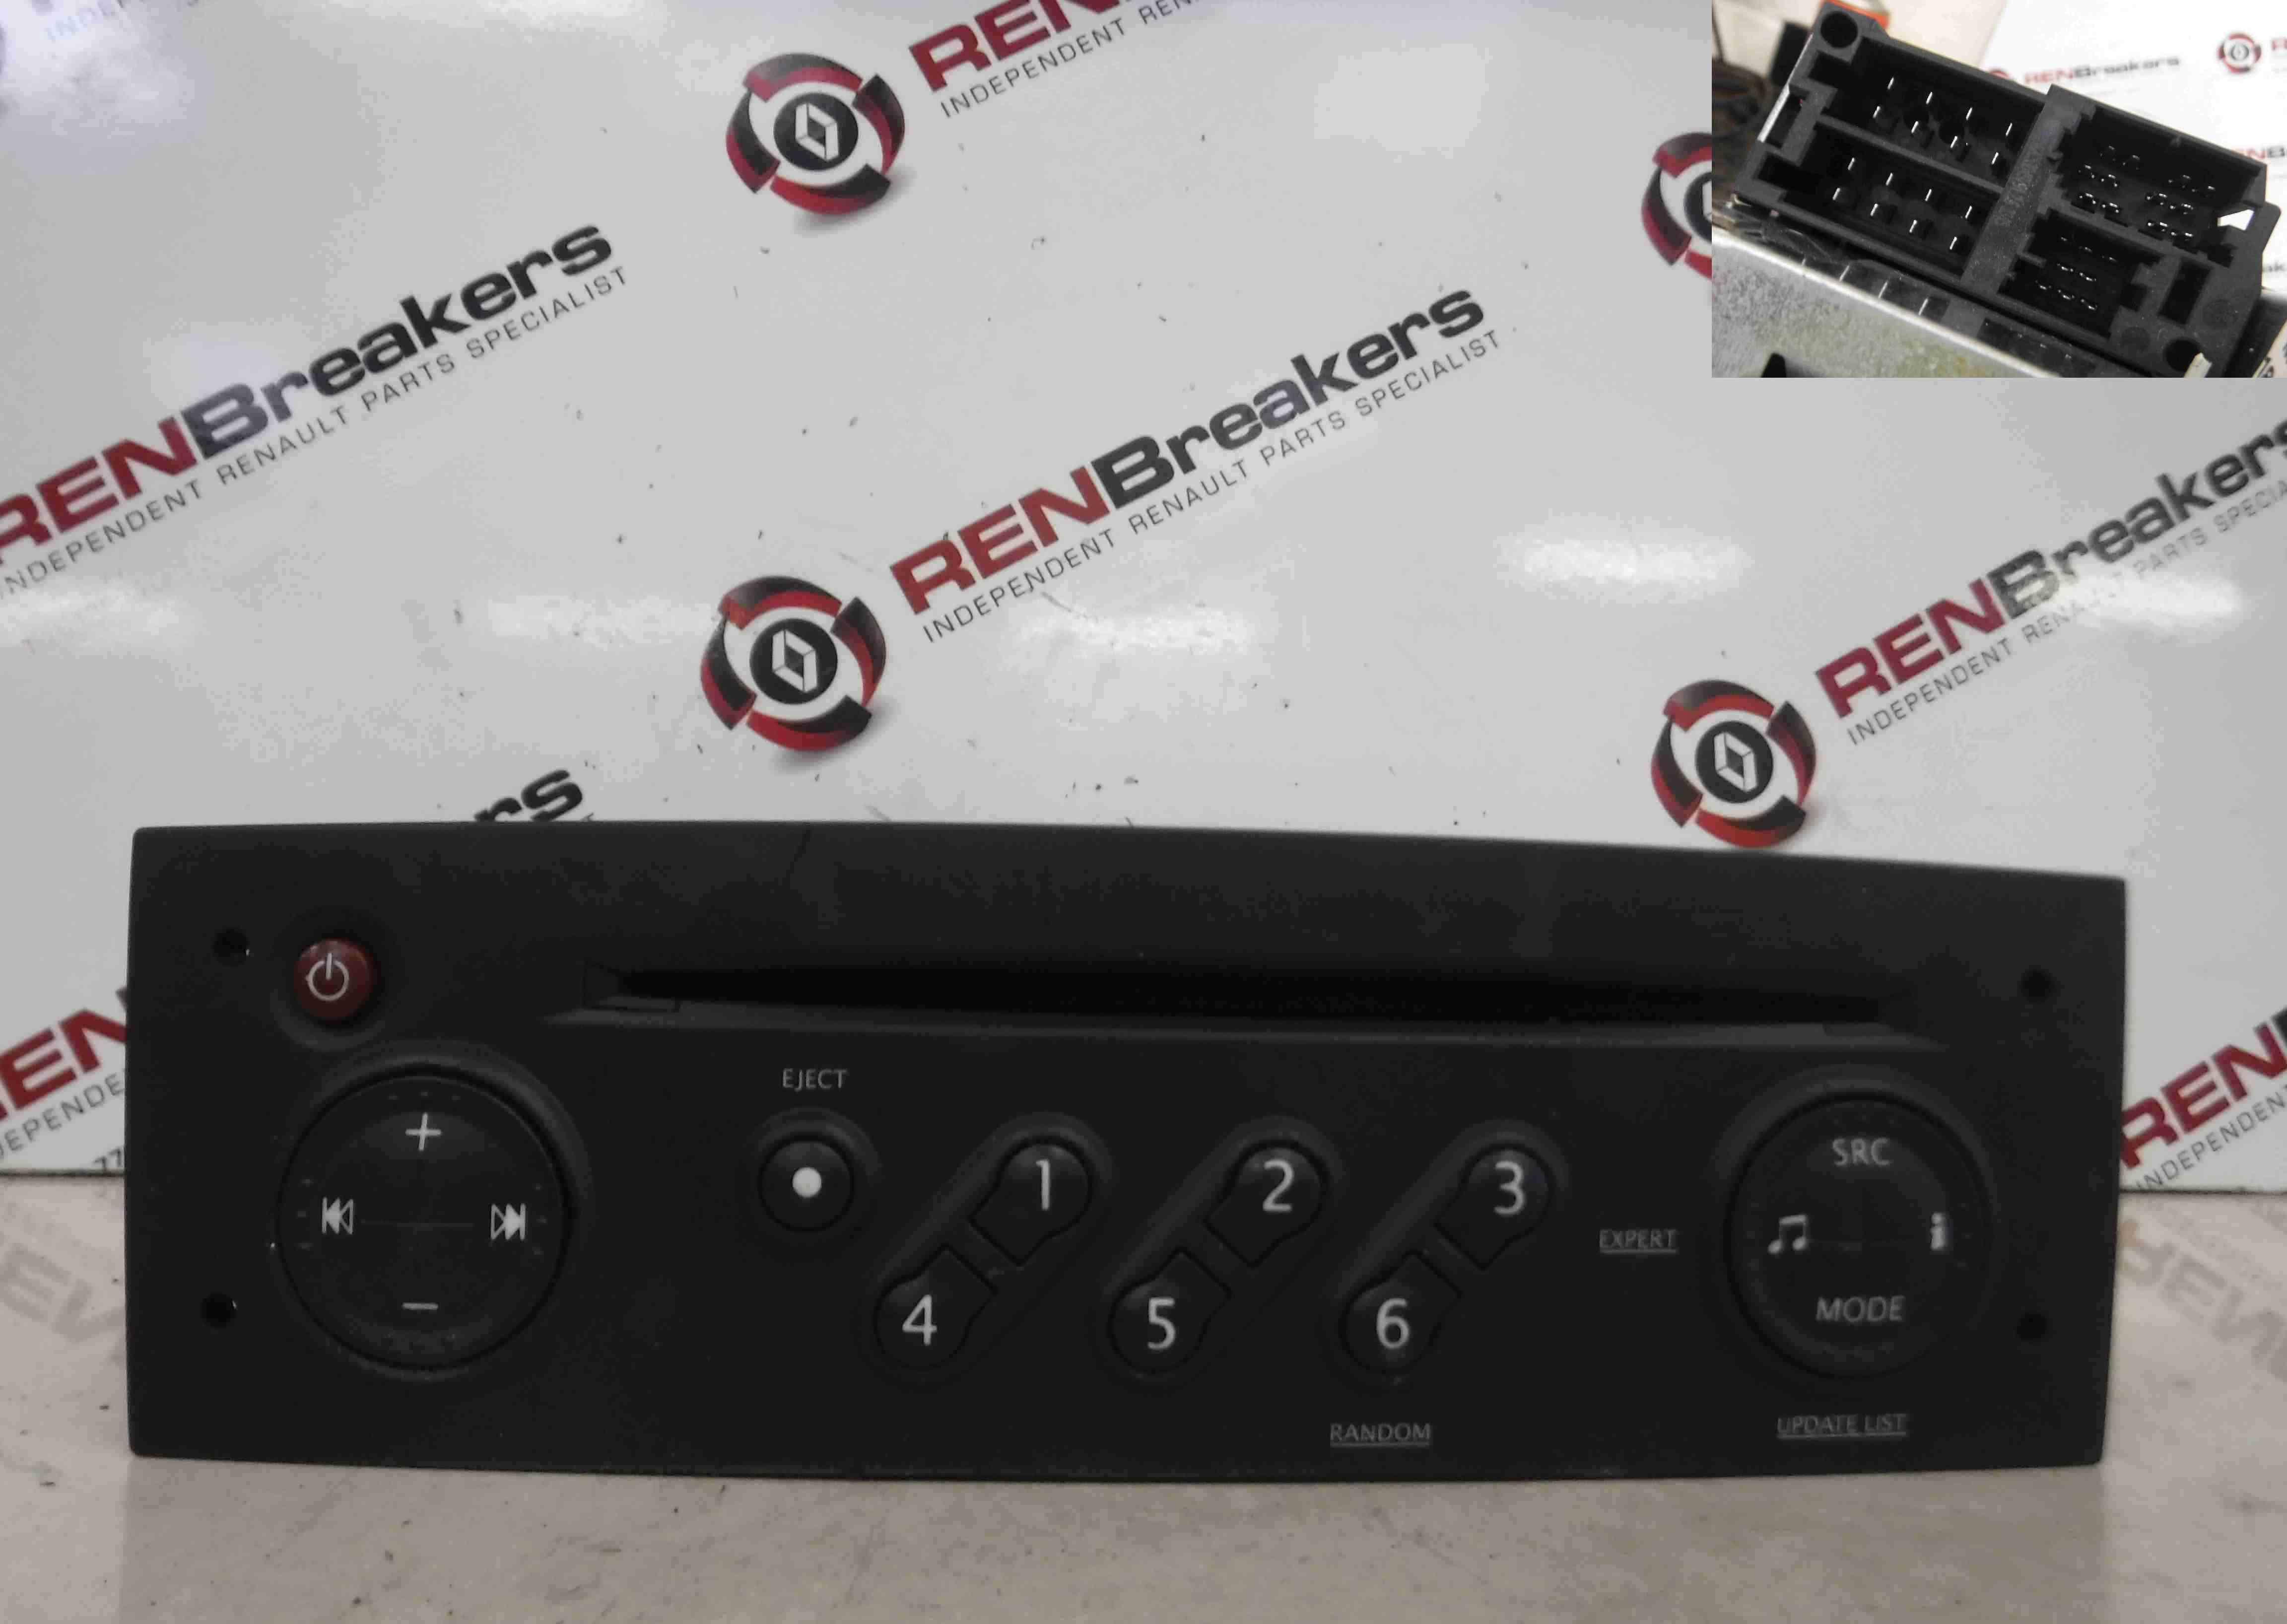 Renault Megane 2002-2008 Radio Cd Player Update List +  Code 8200483757